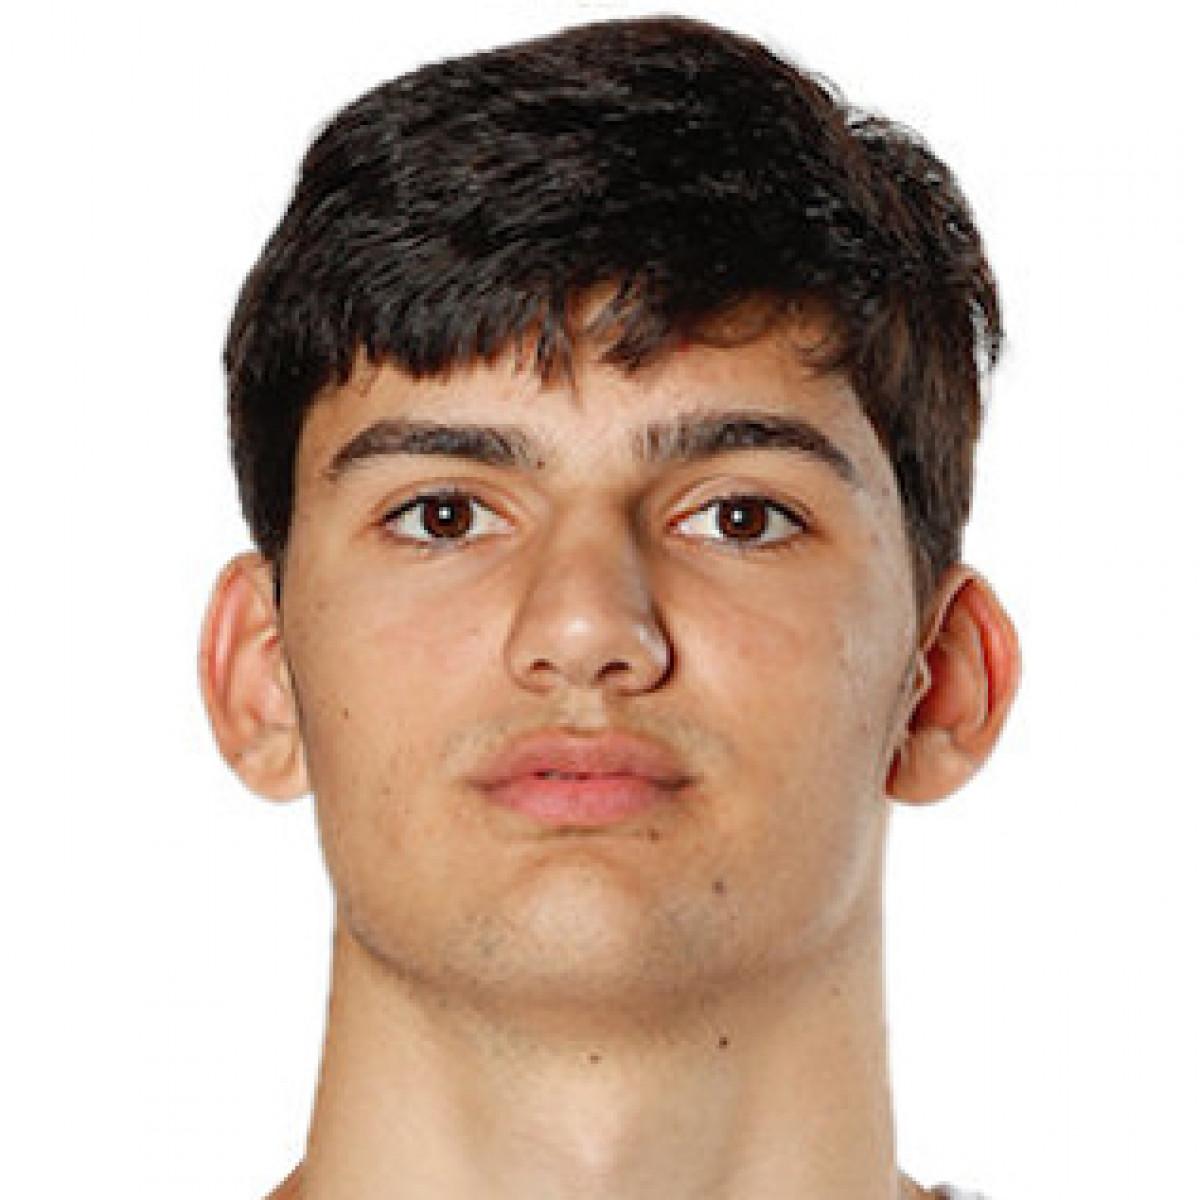 Tristan Vukcevic